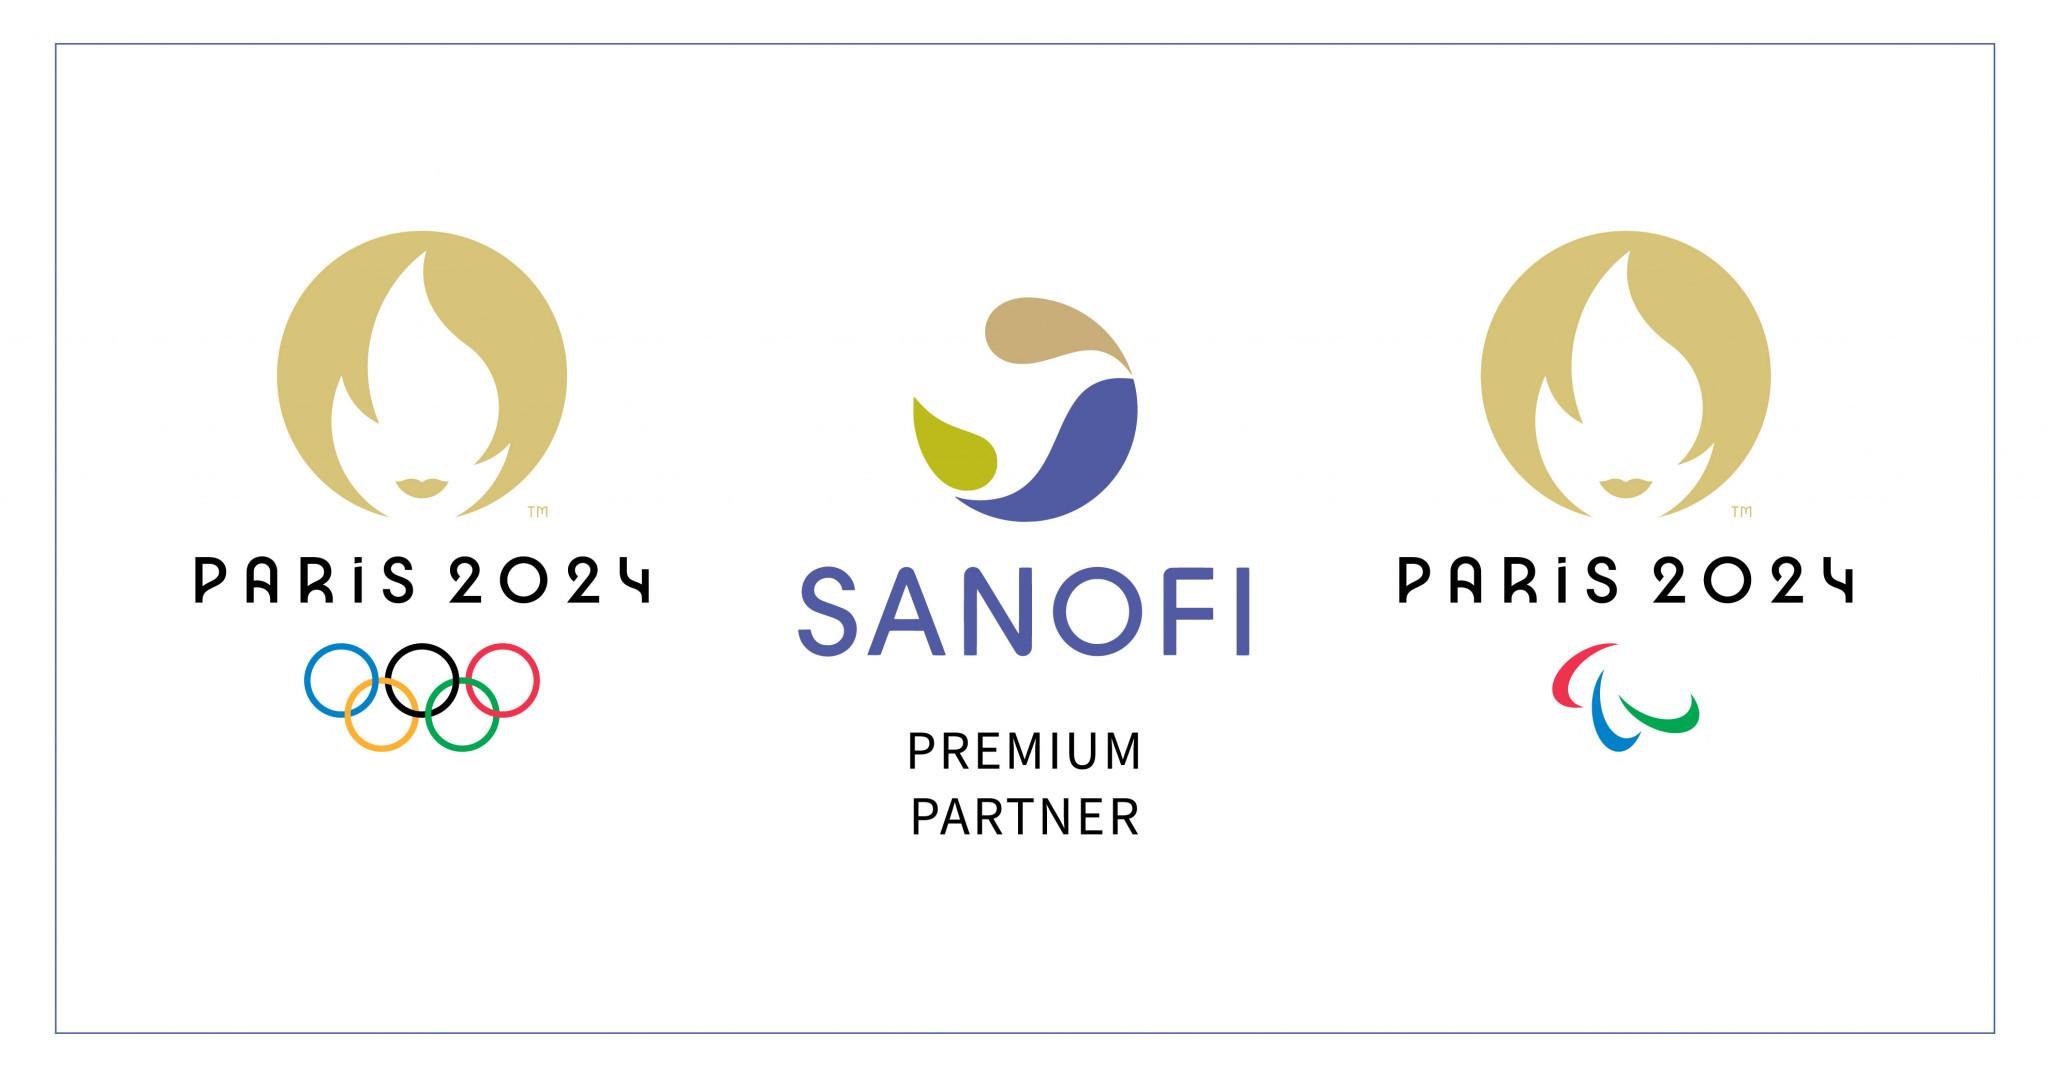 Paris 2024 signs Sanofi as top-tier sponsor for Olympics and Paralympics